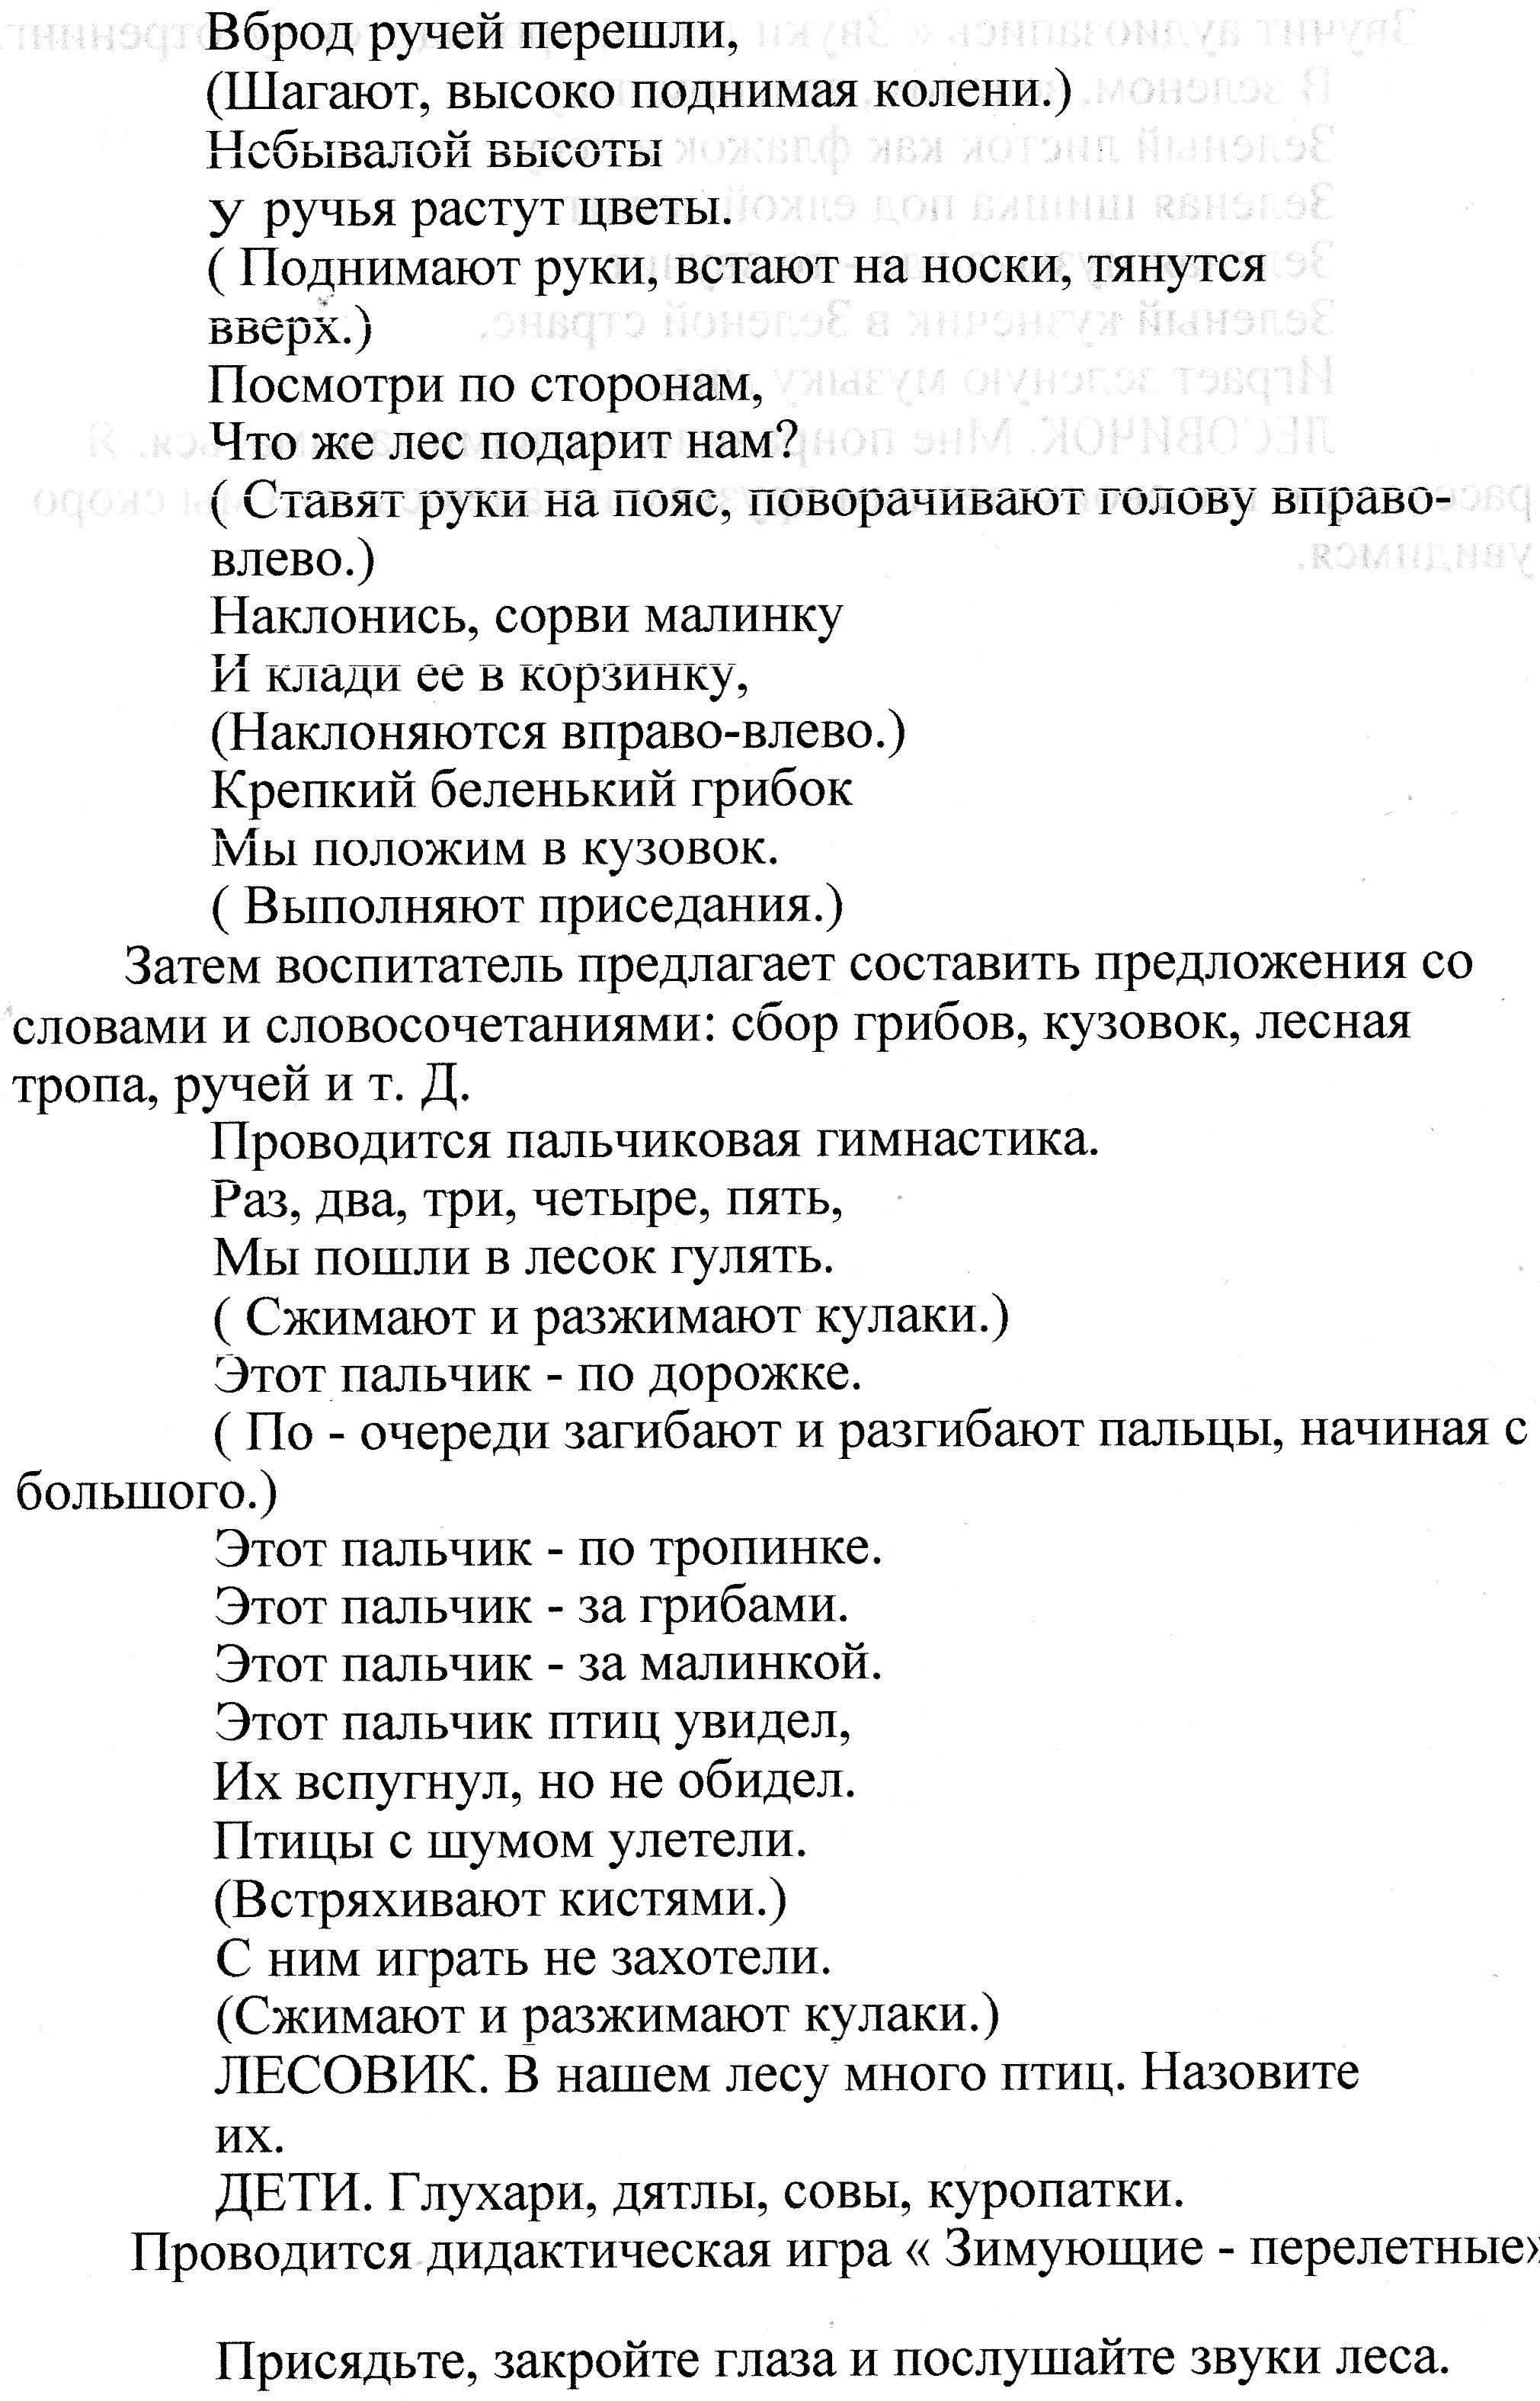 C:\Users\Александр\Pictures\img033.jpg